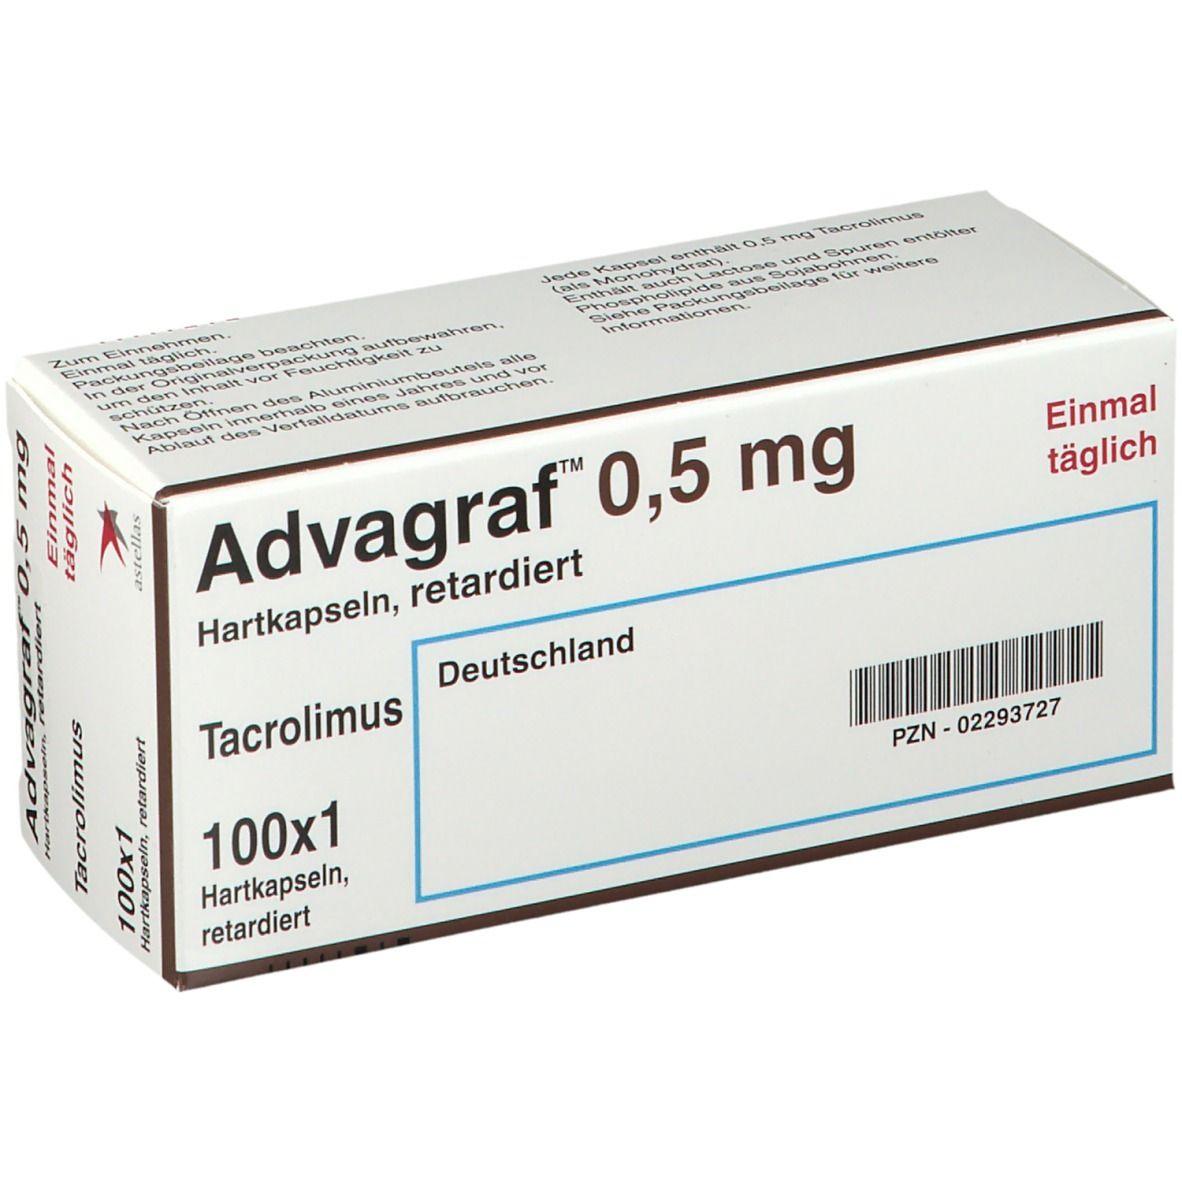 Advagraf 0,5 mg Retardkapseln